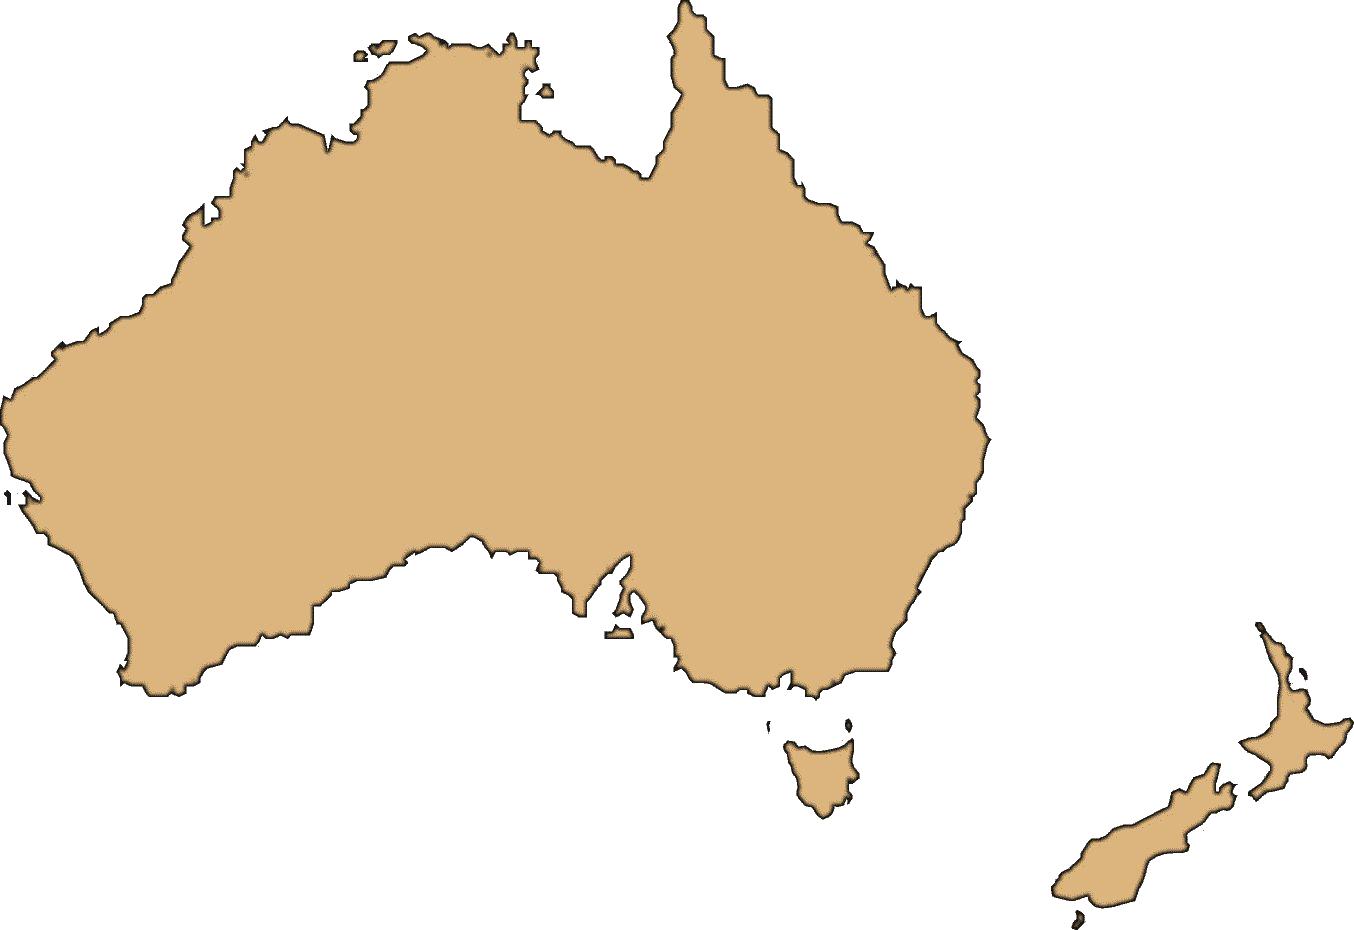 Australiau papua new guinea. Australia clipart transparent background